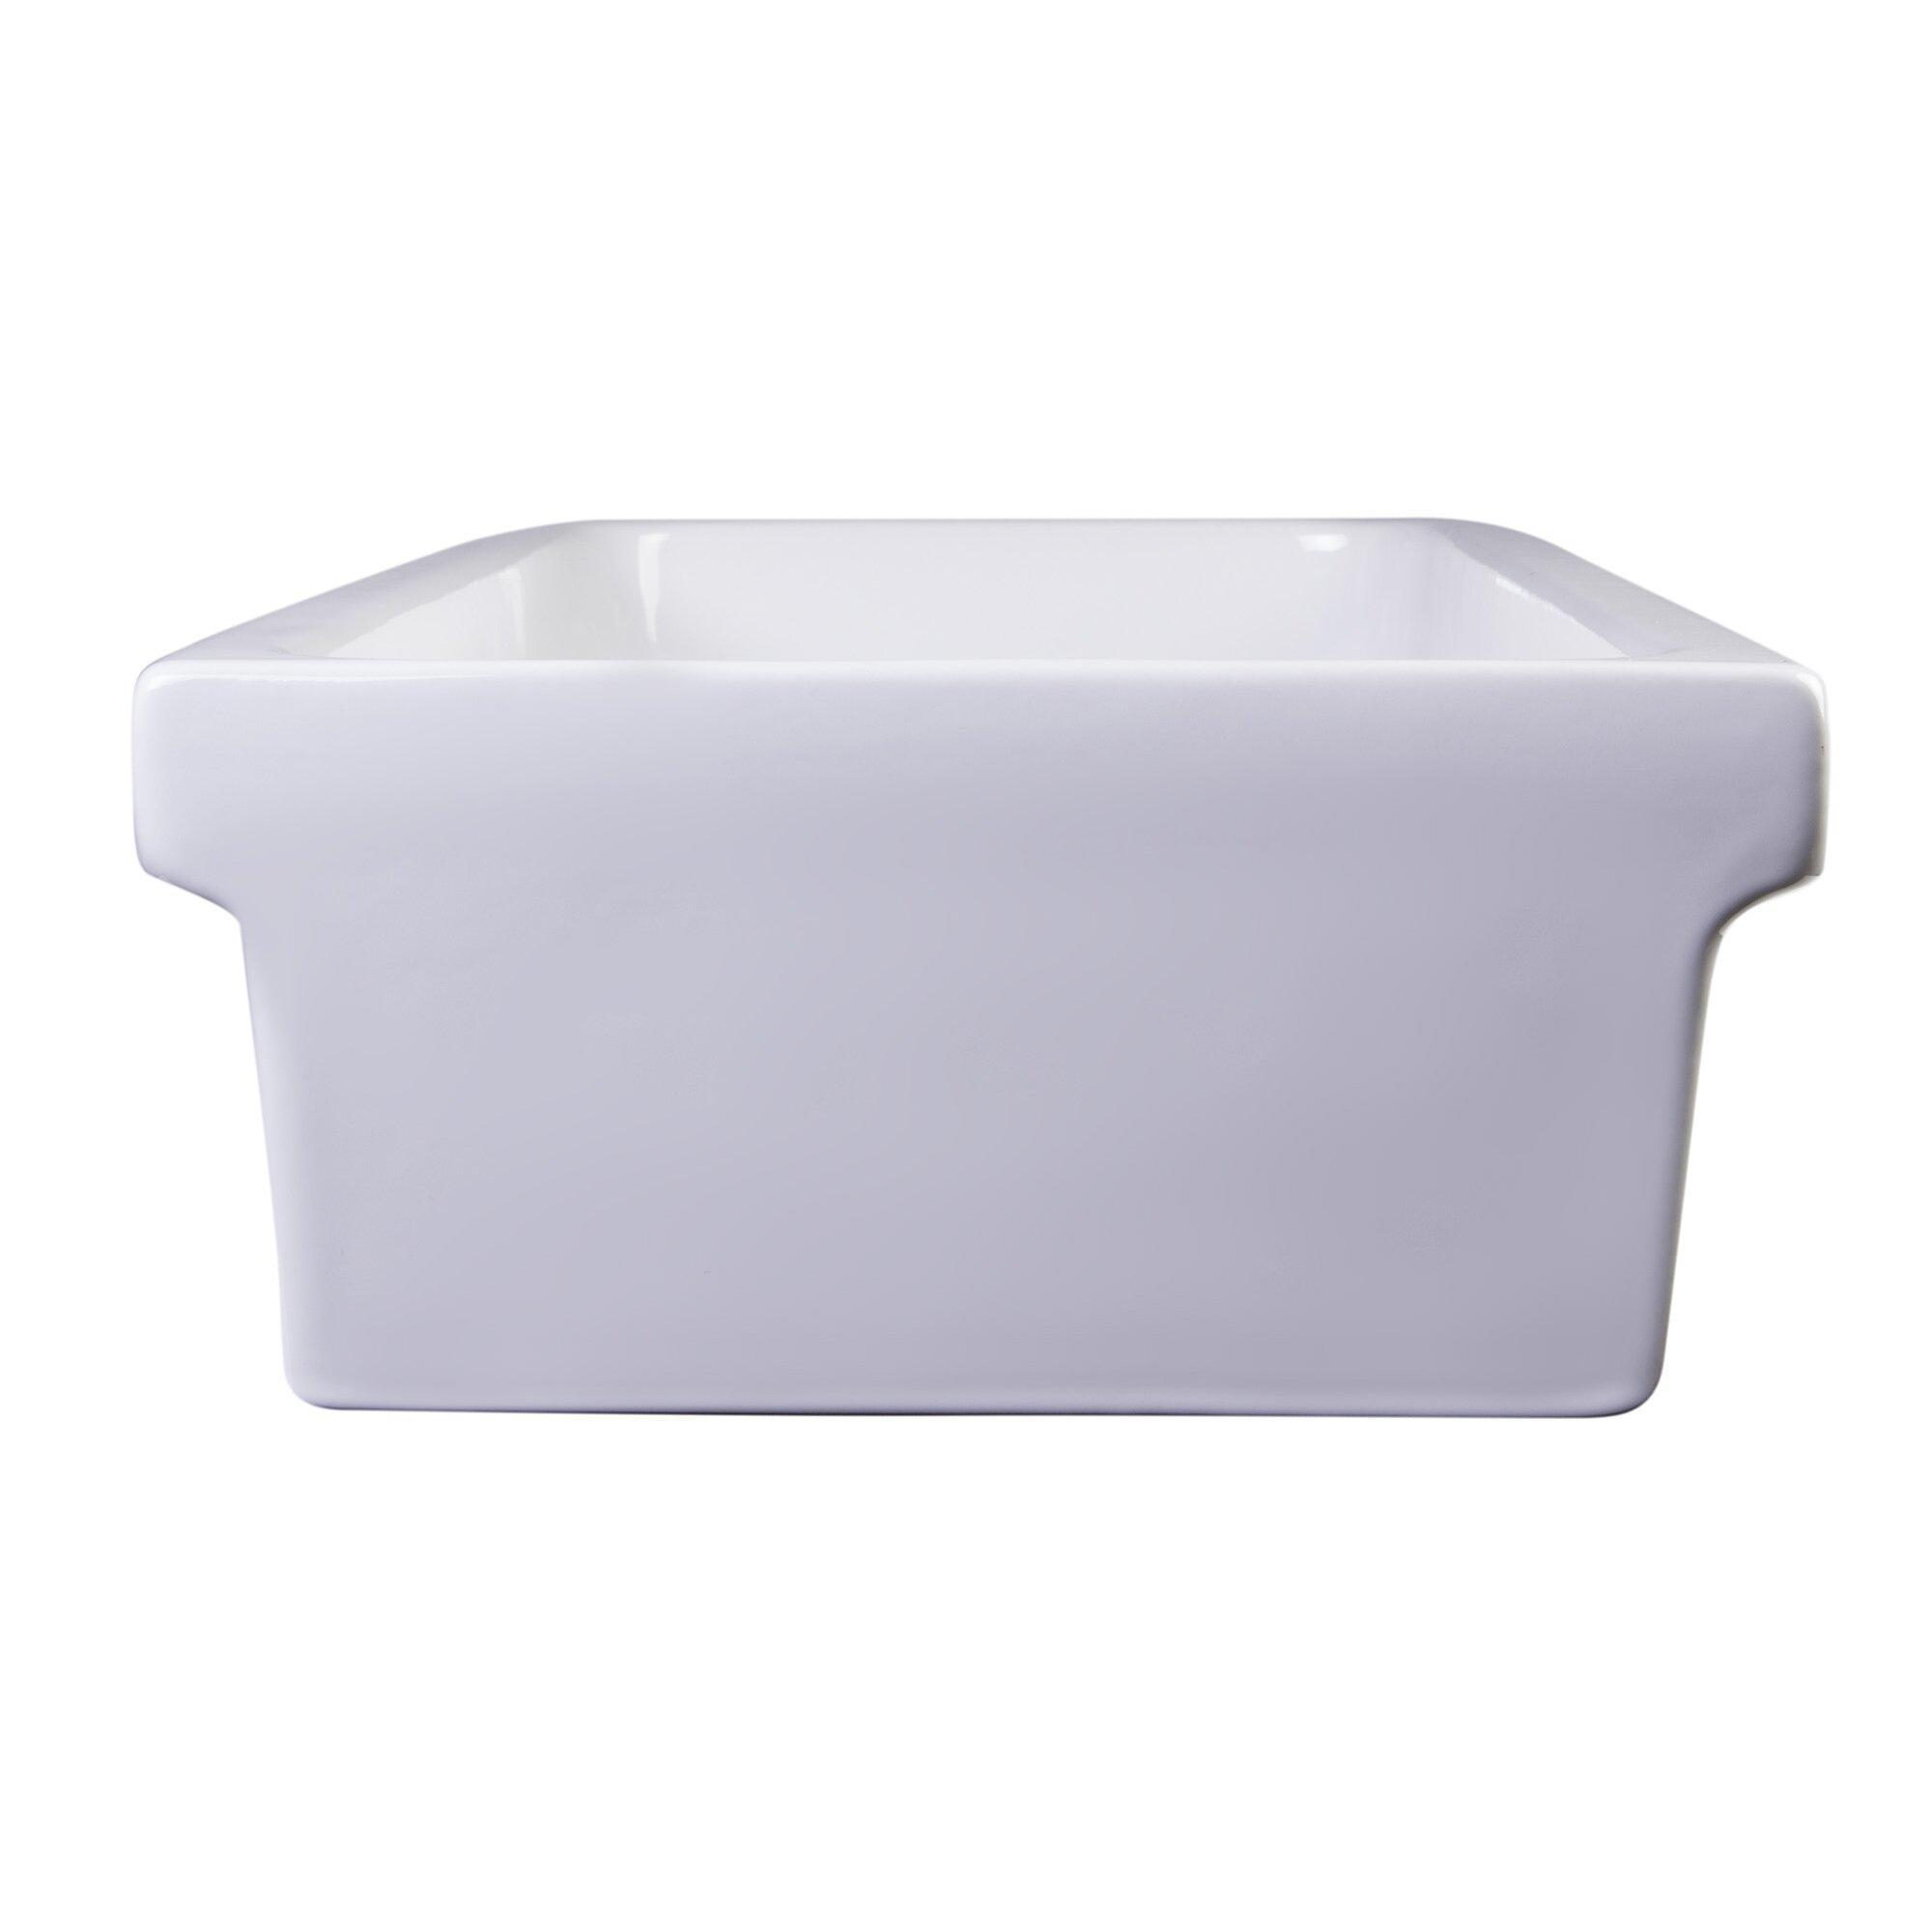 48 Trough Sink : ... Brand 47.4